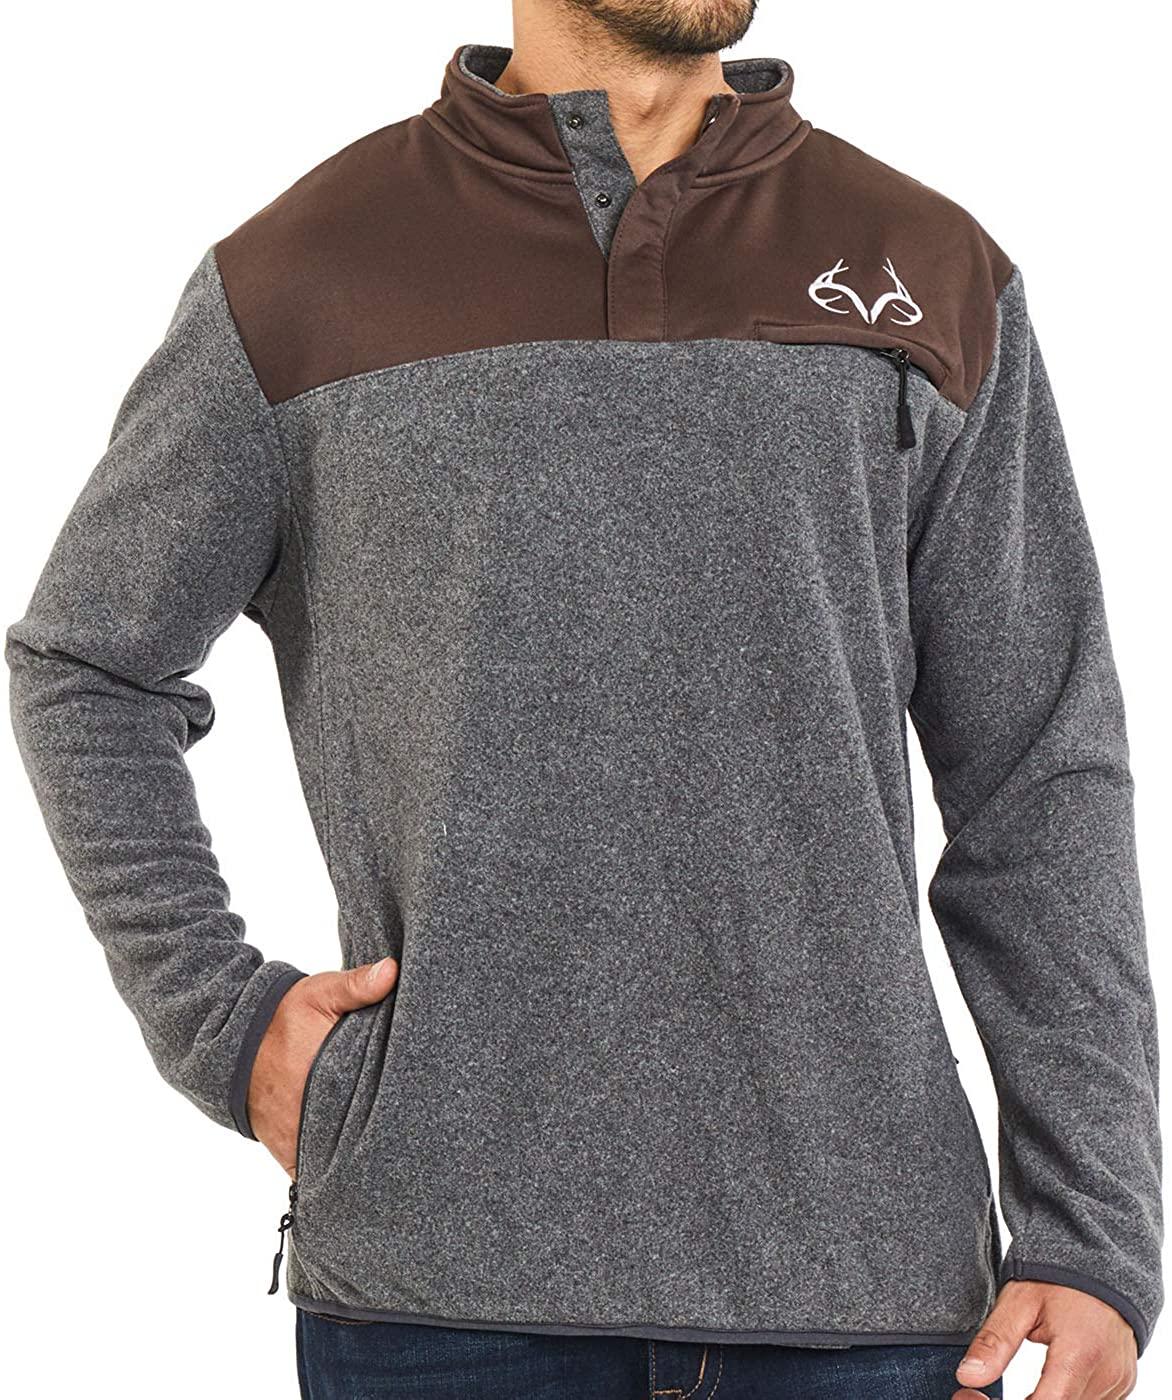 Realtree Men's 1/4 Zip and Snap Button White Edge Camo Pullover Fleece Sweater Jackets